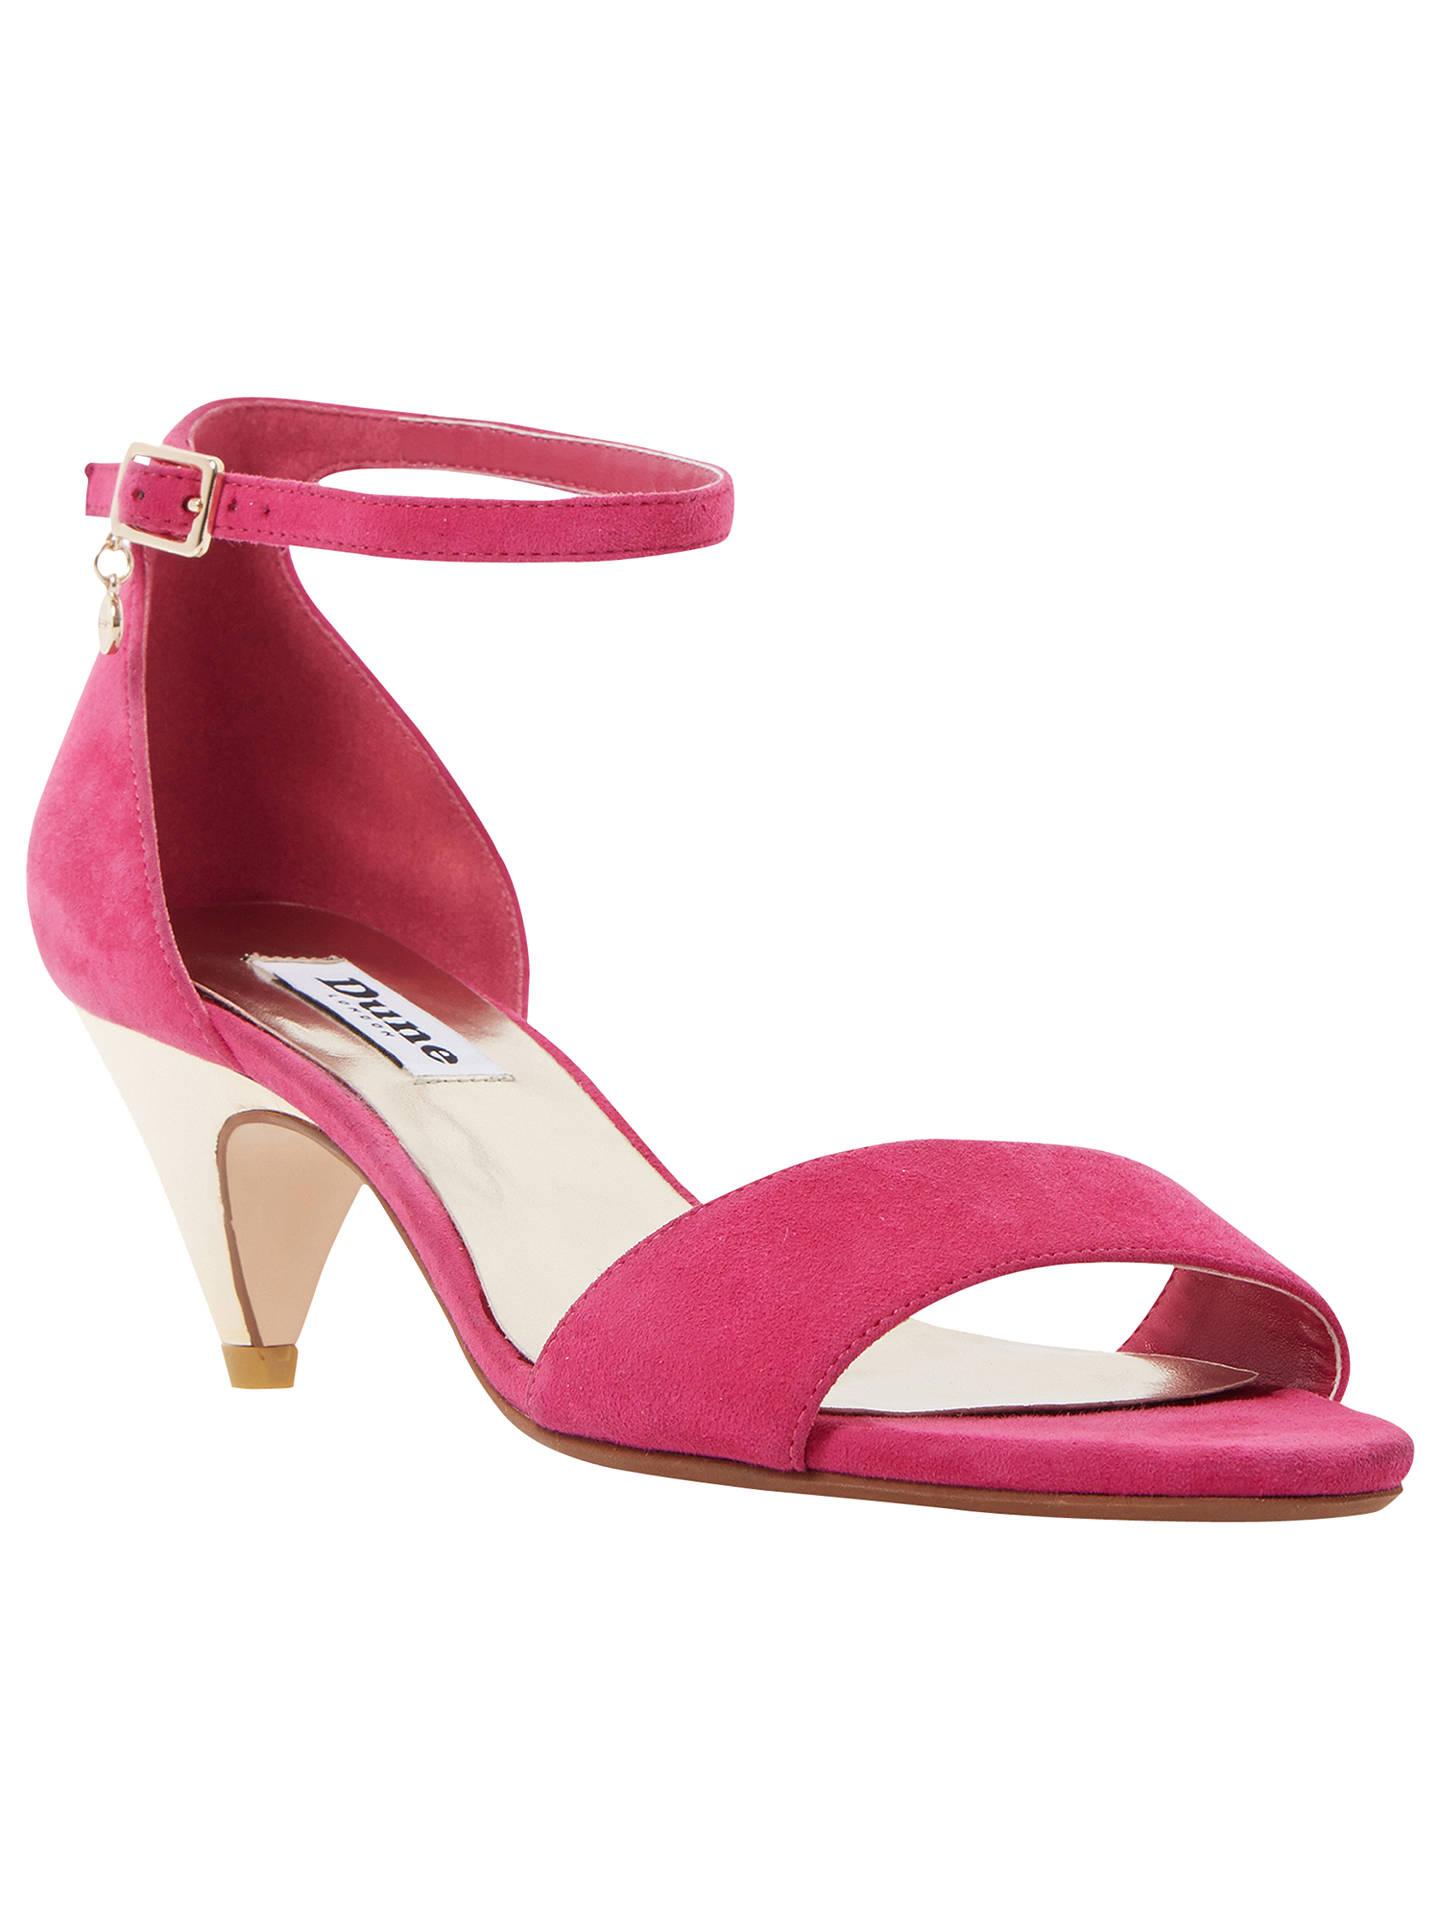 6fc5ad9a33 Buy Dune Marina Kitten Heel Two Part Sandals, Raspberry Suede, 3 Online at  johnlewis ...